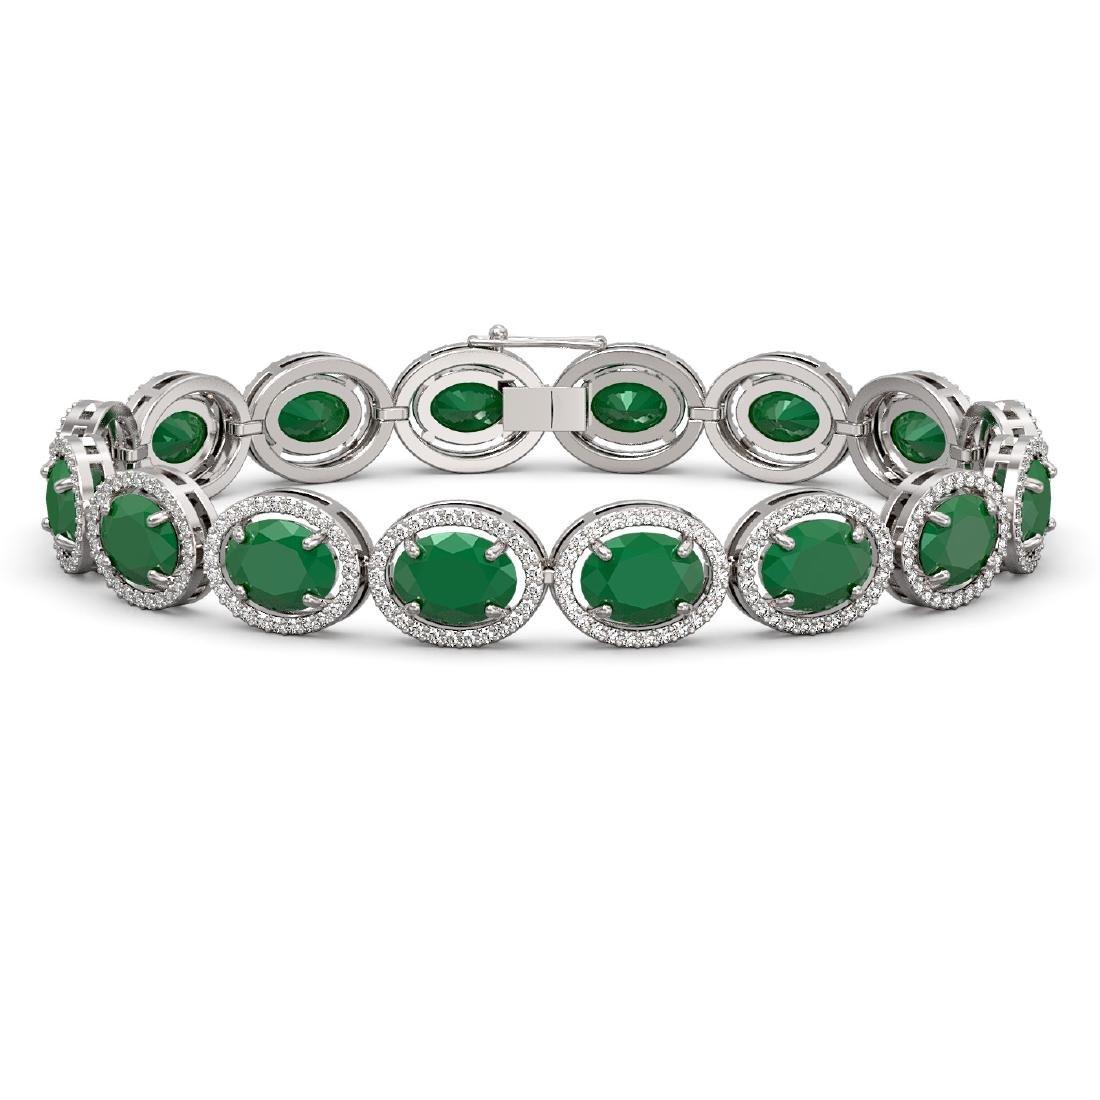 31.79 CTW Emerald & Diamond Halo Bracelet 10K White